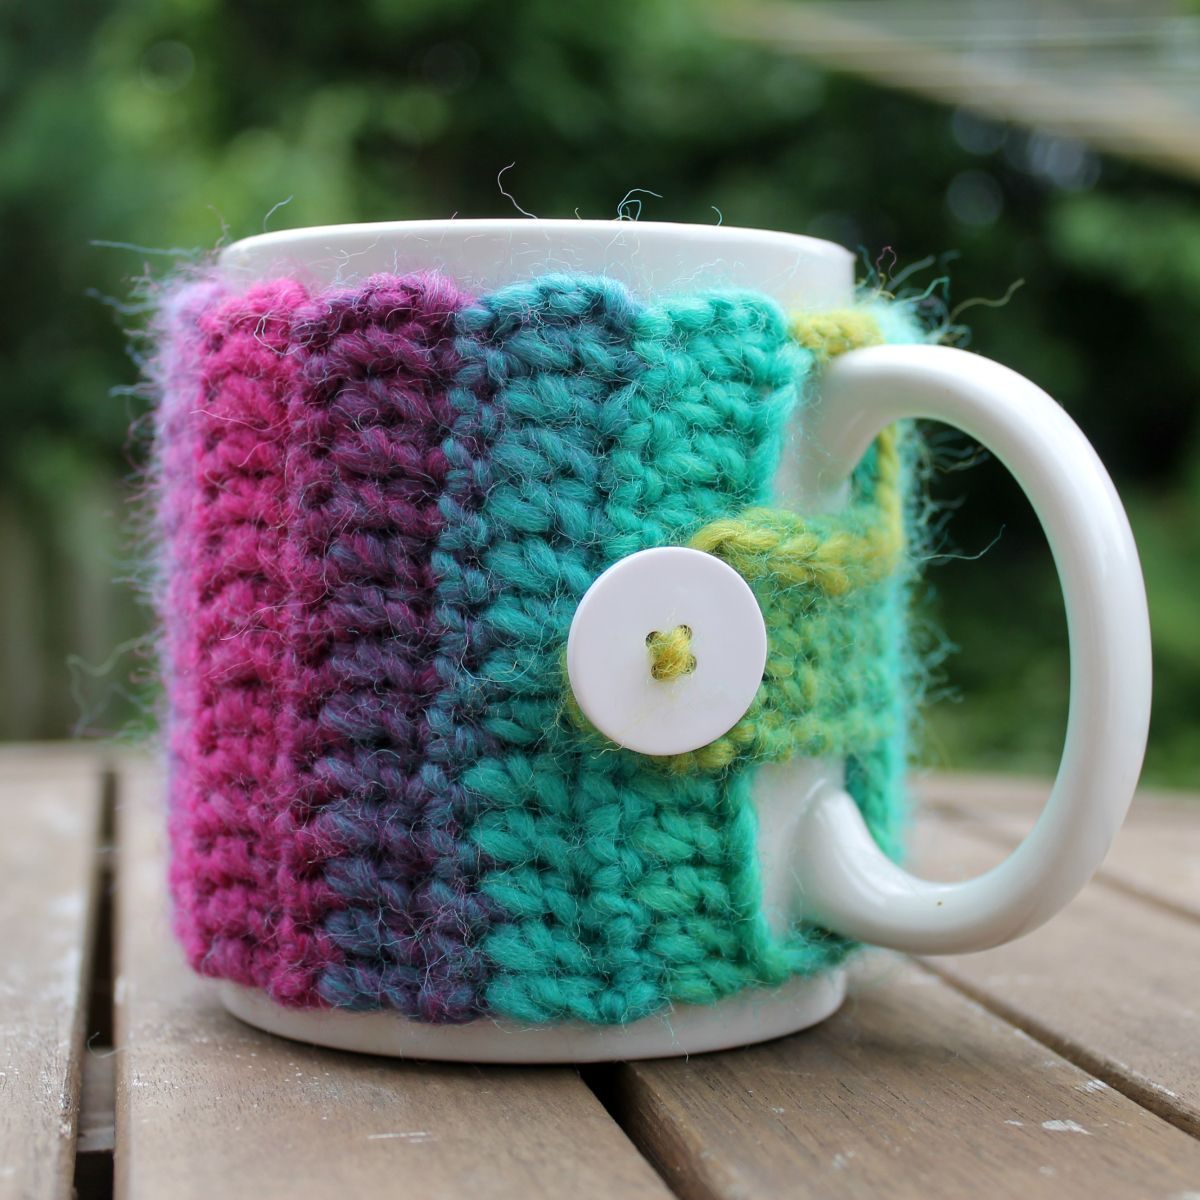 Mug cozy - links to a free pattern | Artesanato | Pinterest | Tejido ...